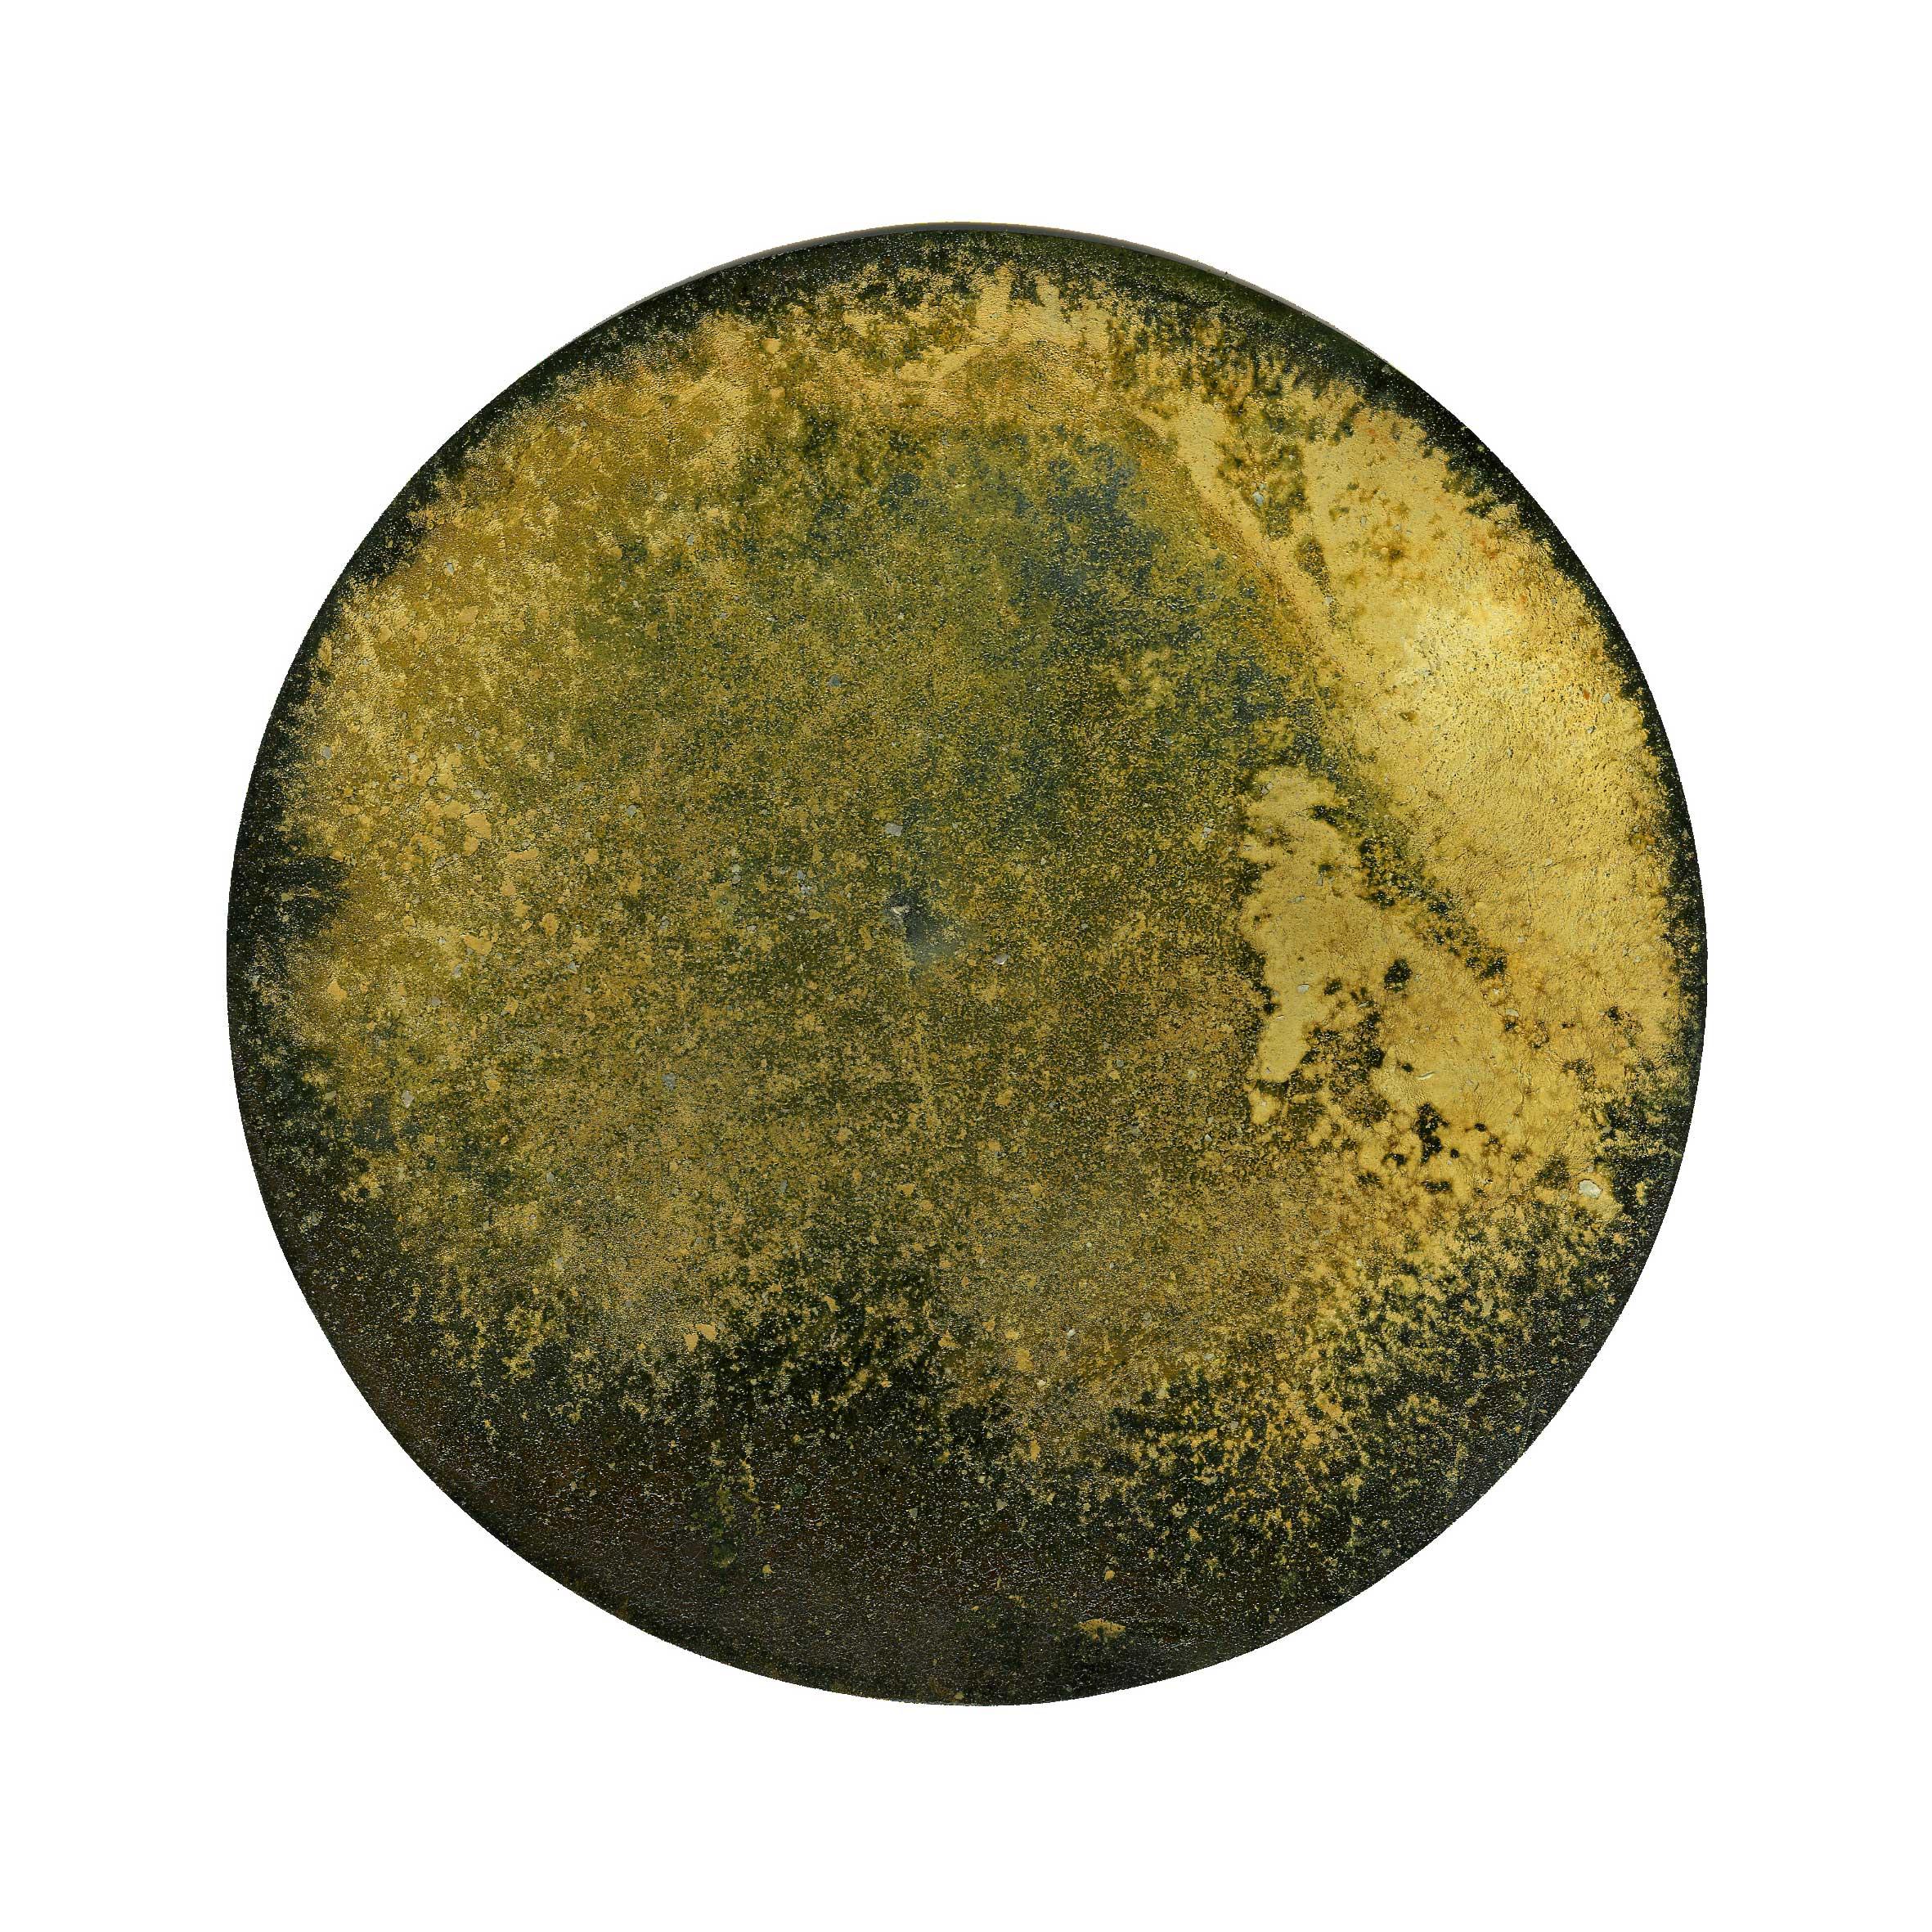 IRON AND TIME (IX) 2010  oxidised iron disc  Ø 120 mm